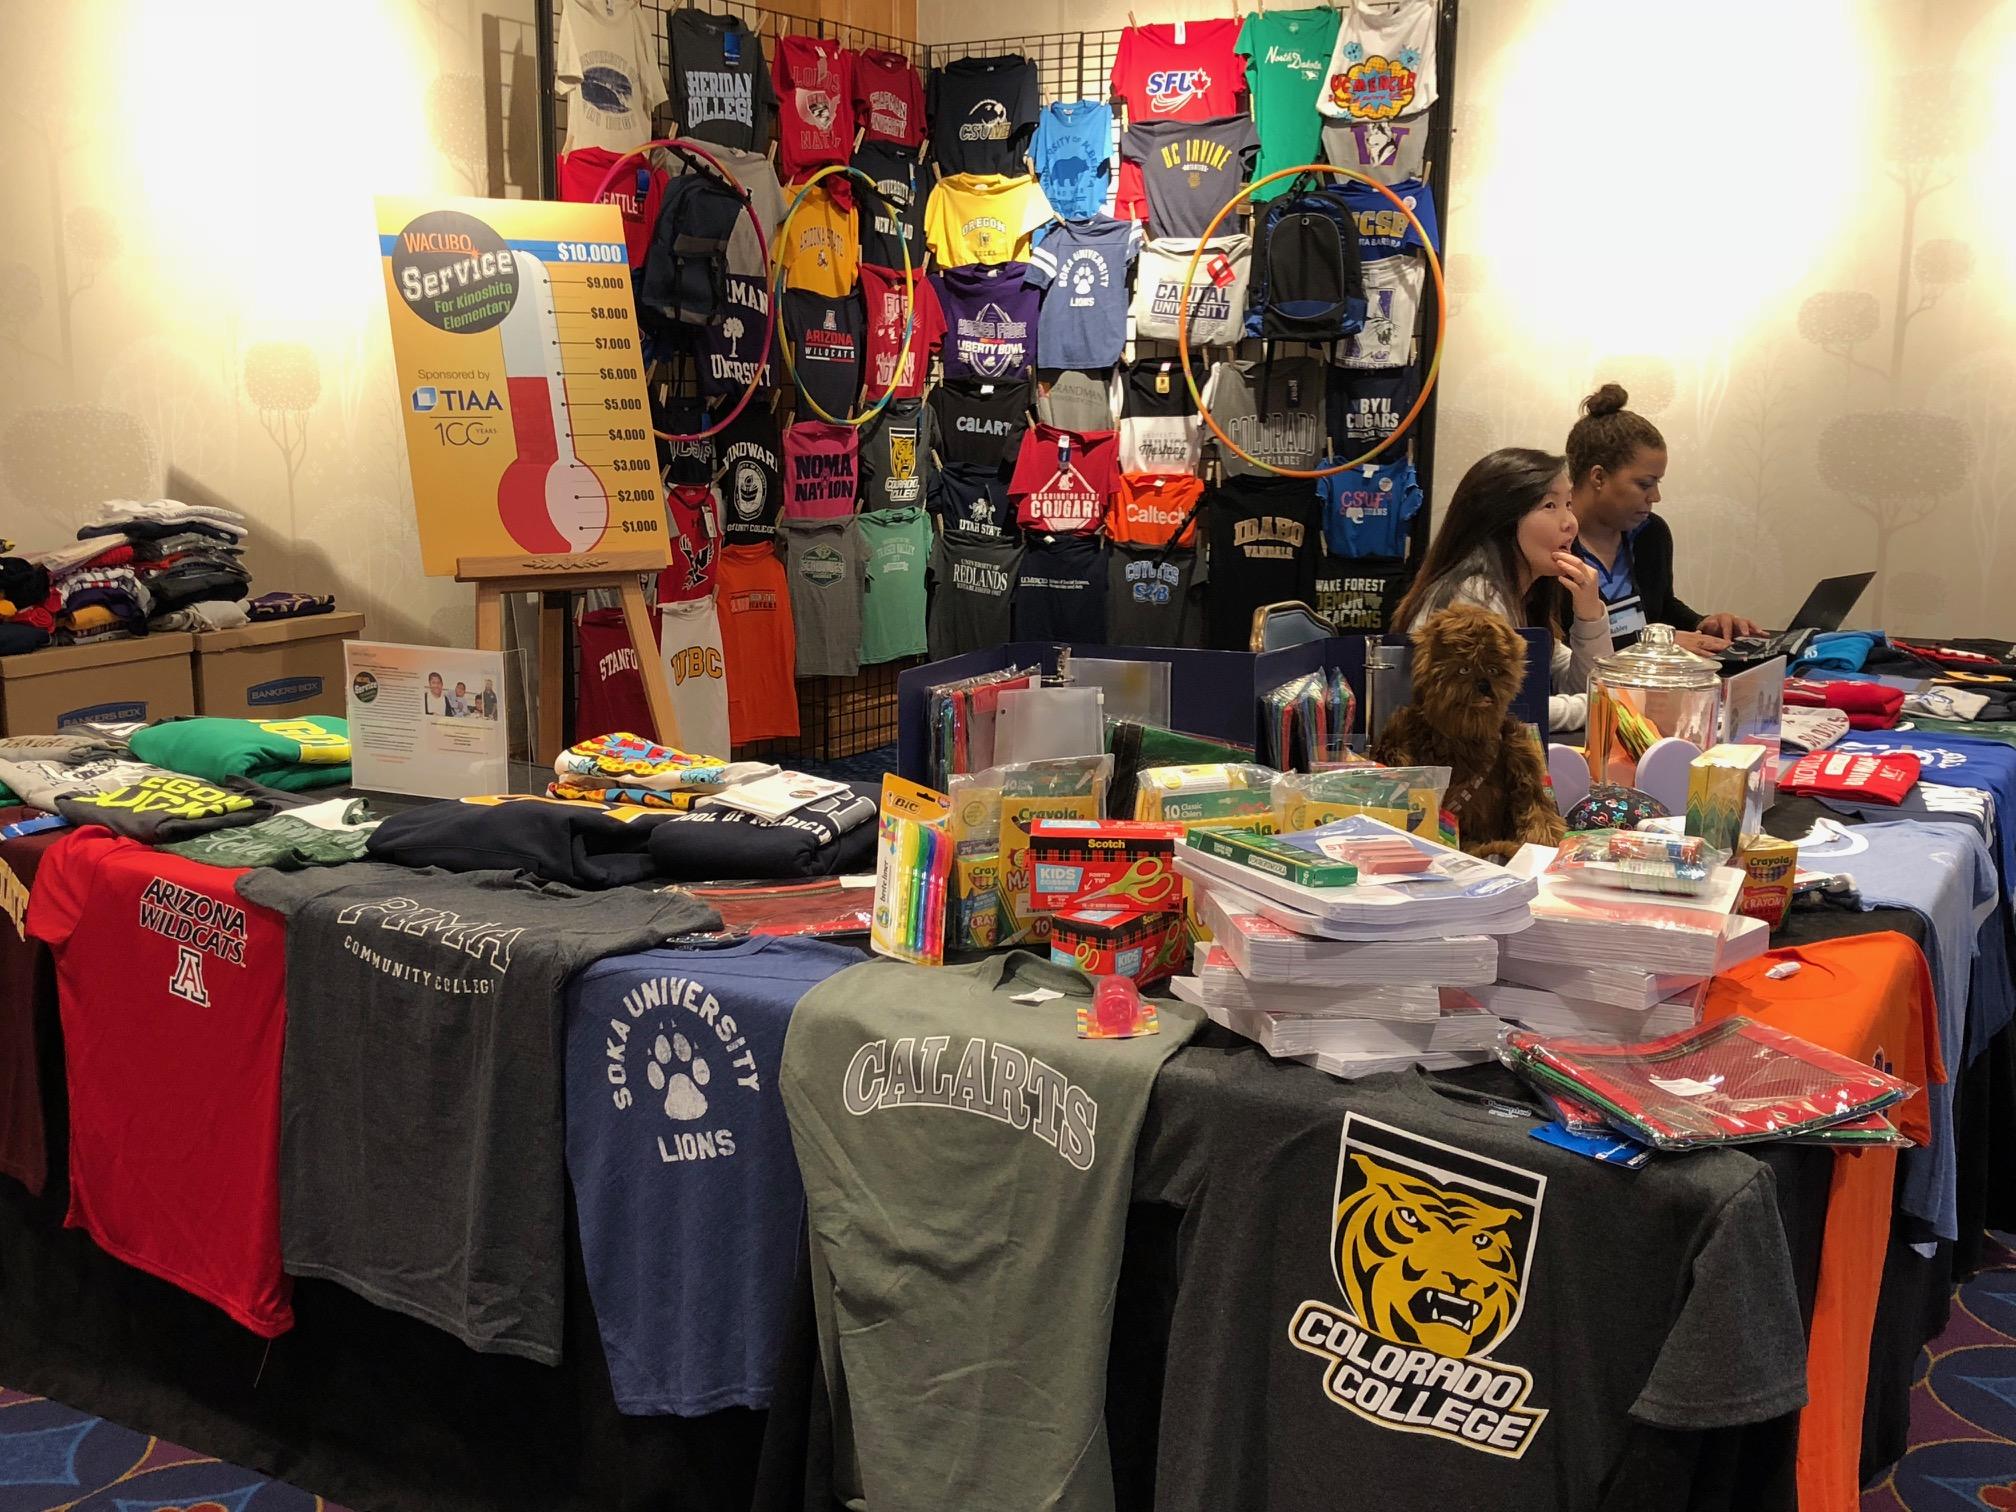 Photo: Past service project, t-shirts